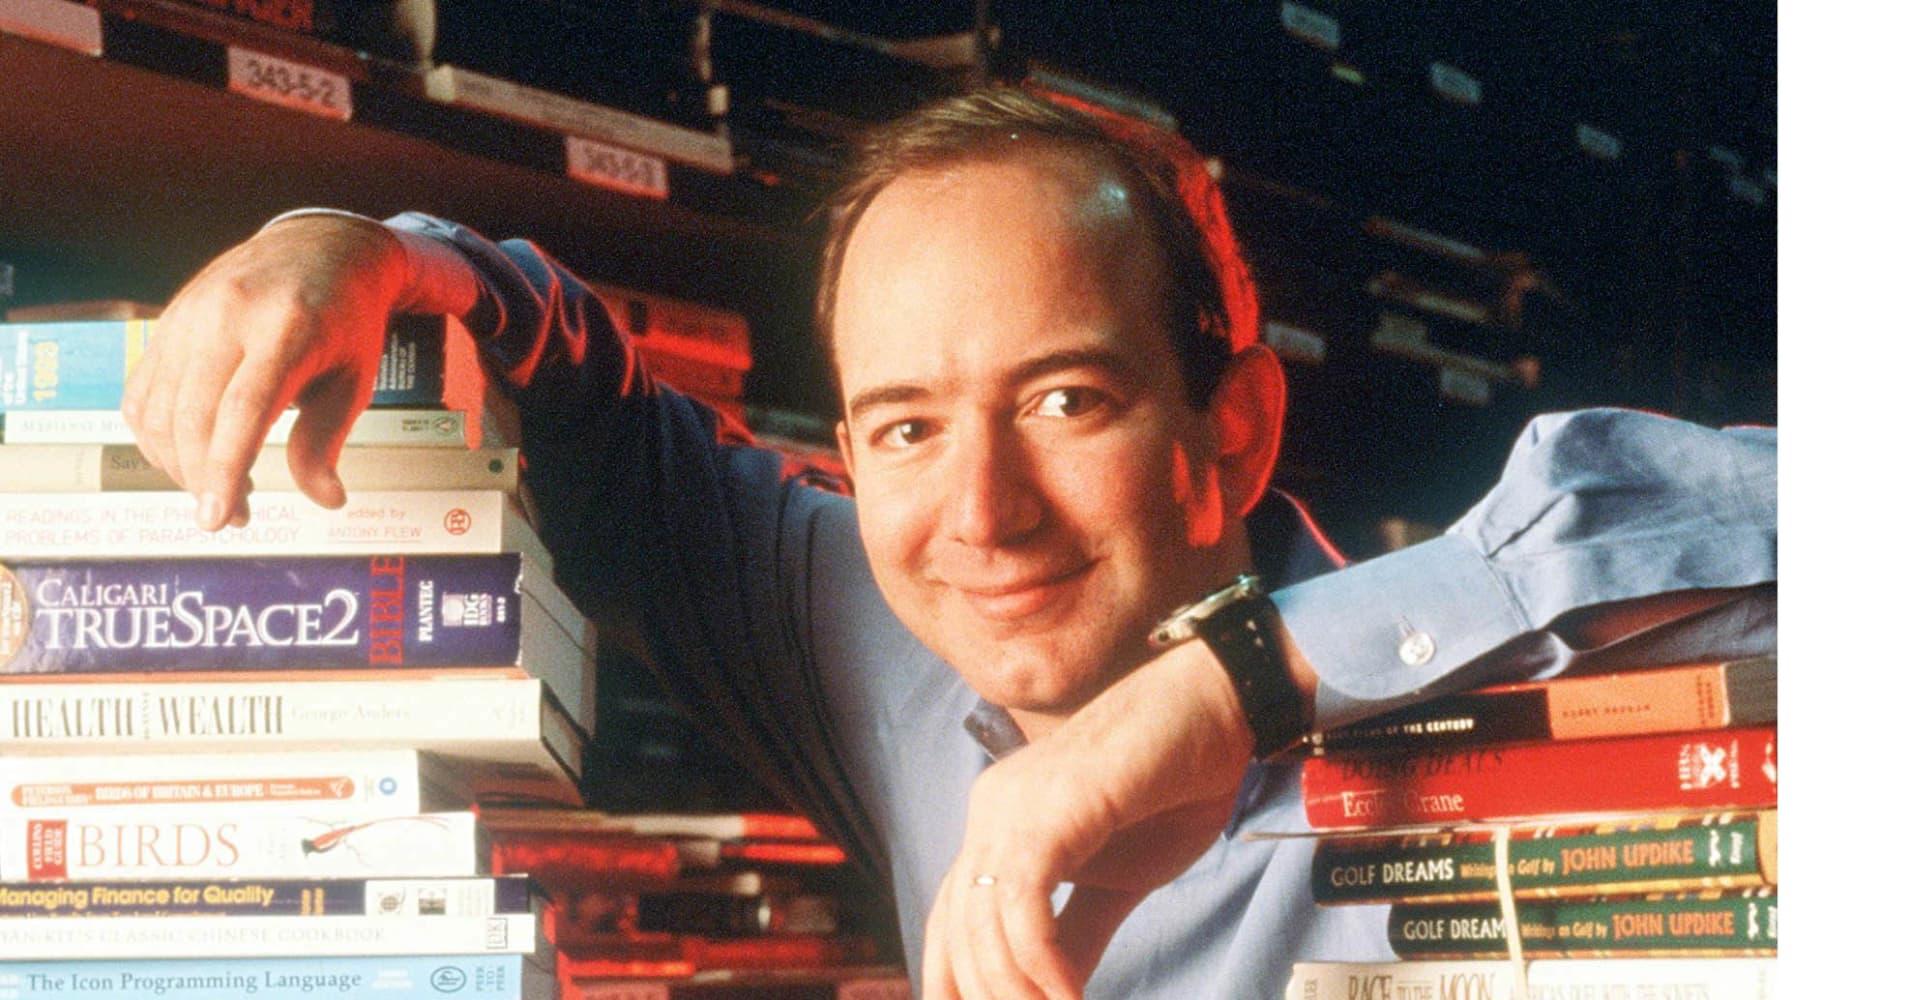 Jeff Bezos, founder and Ceo of Amazon